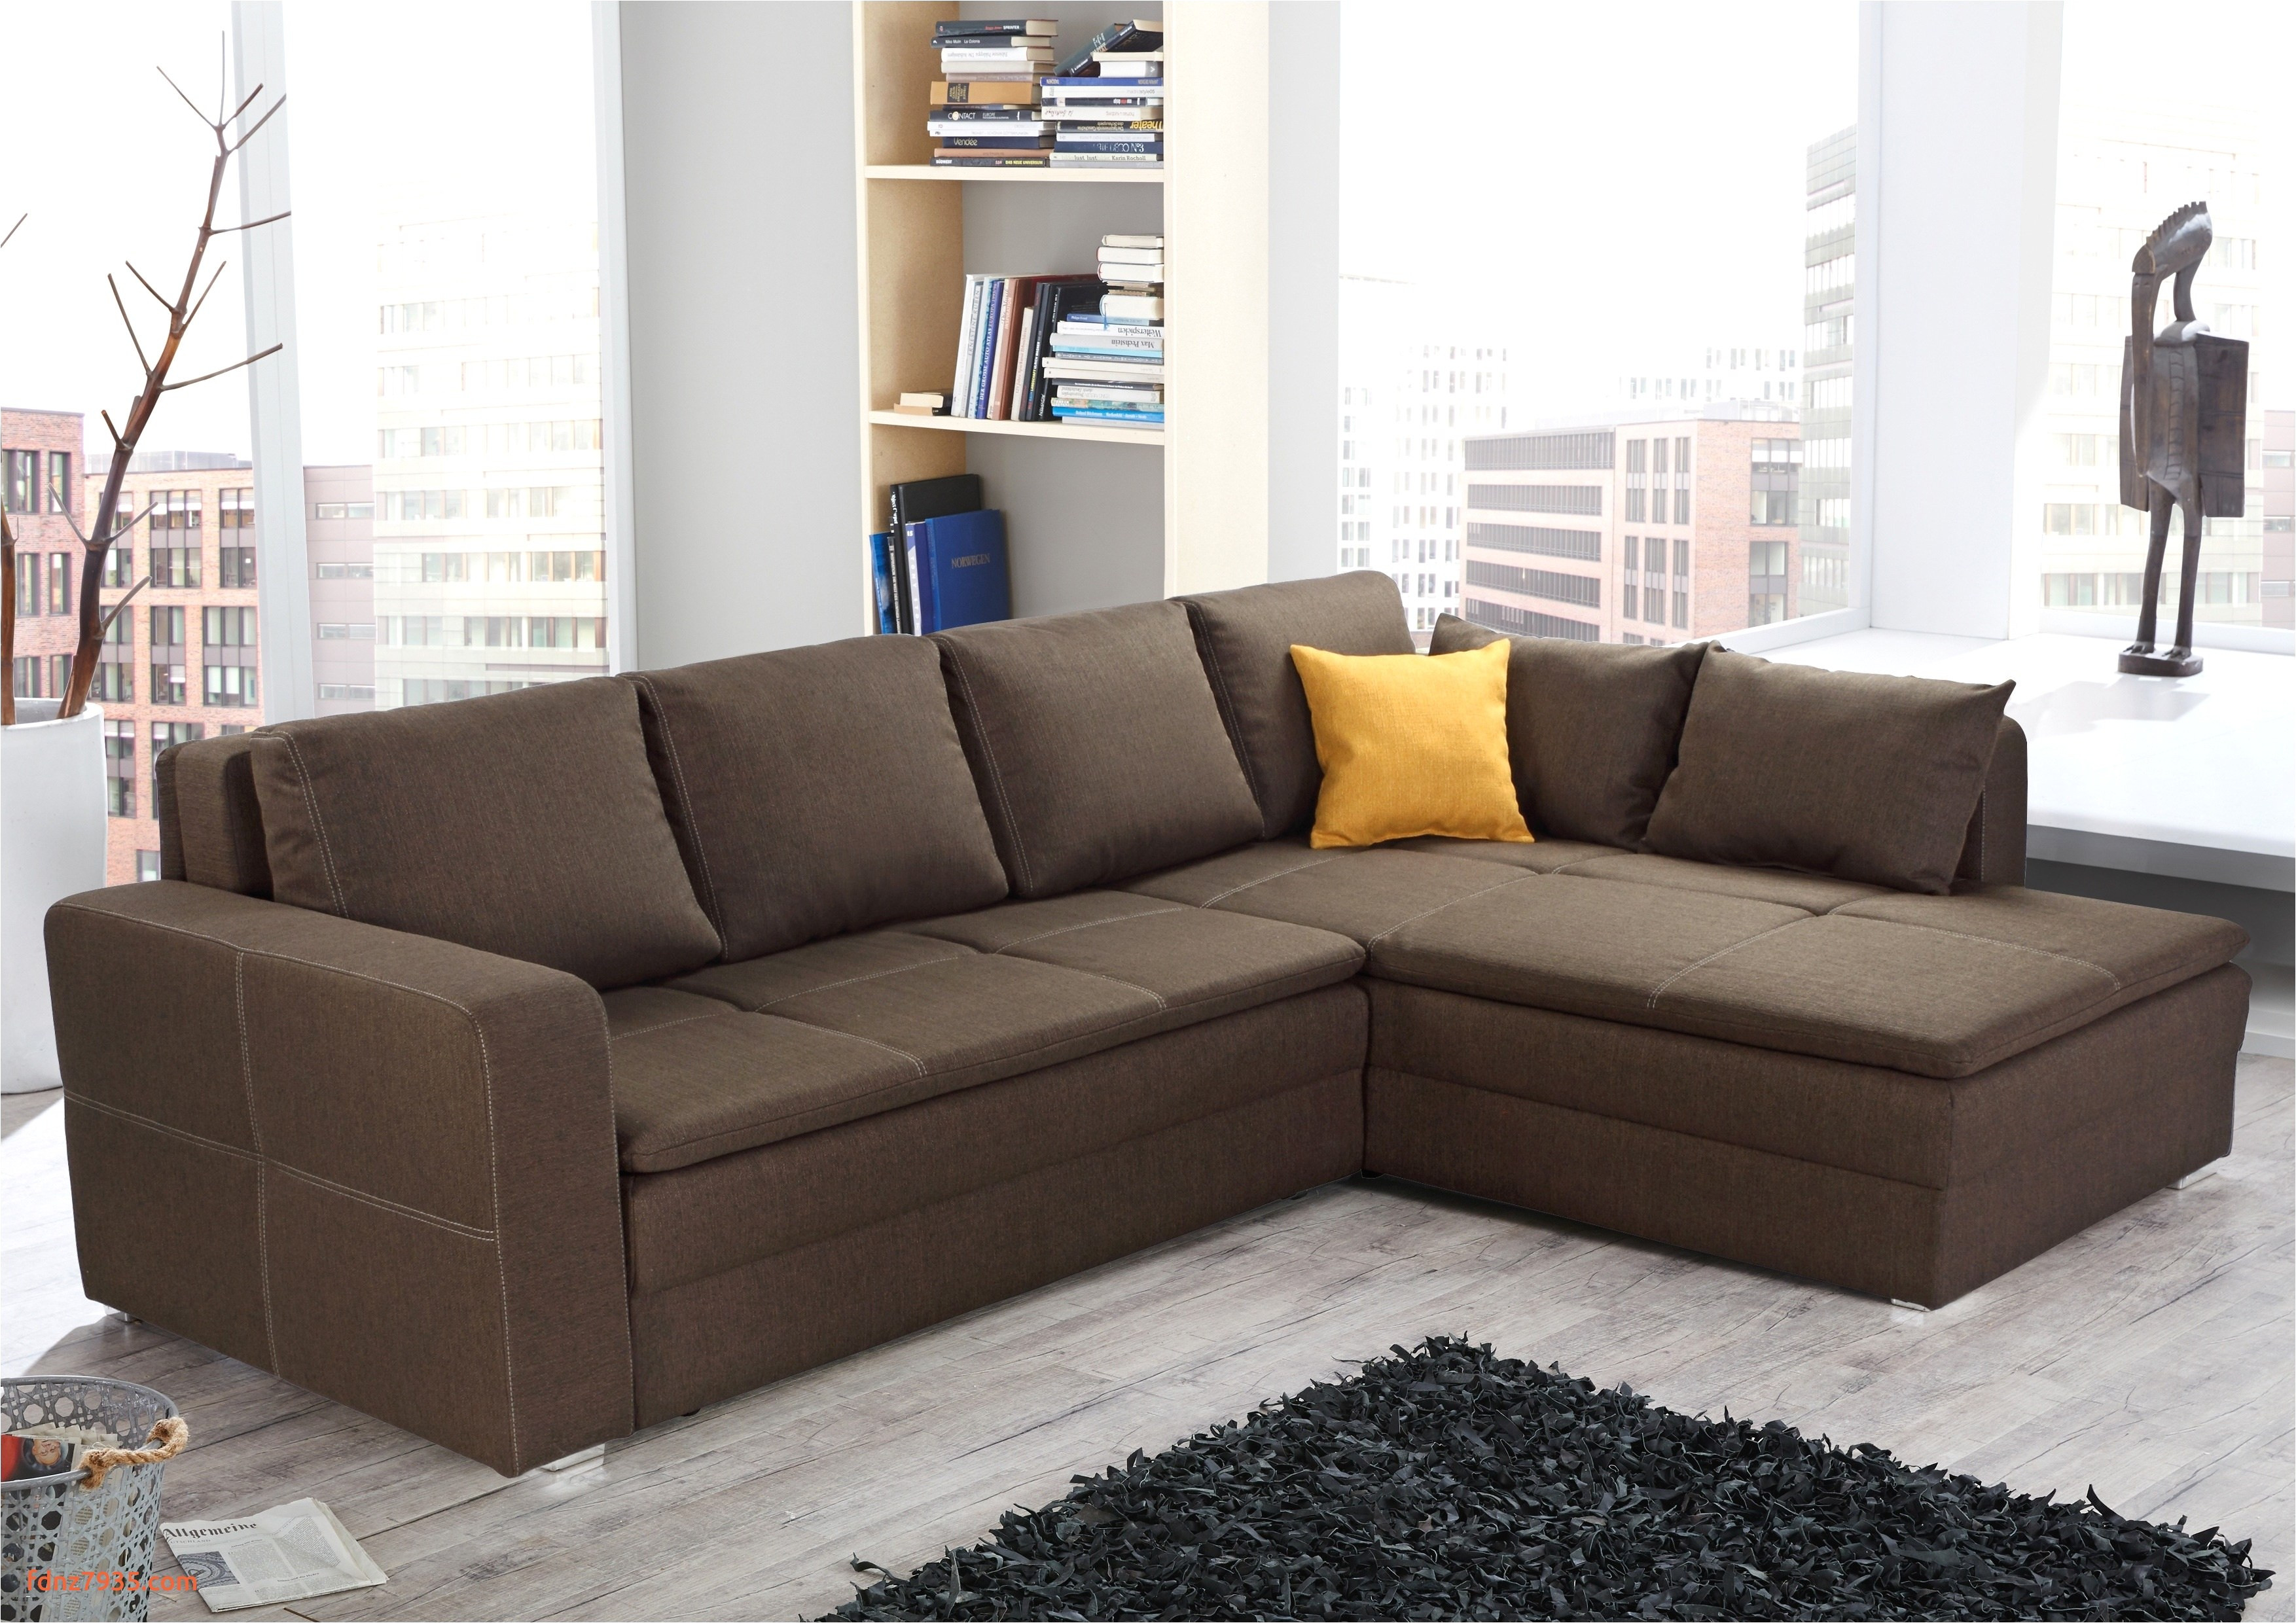 macys sofa set new macys living room furniture style gunstige sofa macys furniture 0d